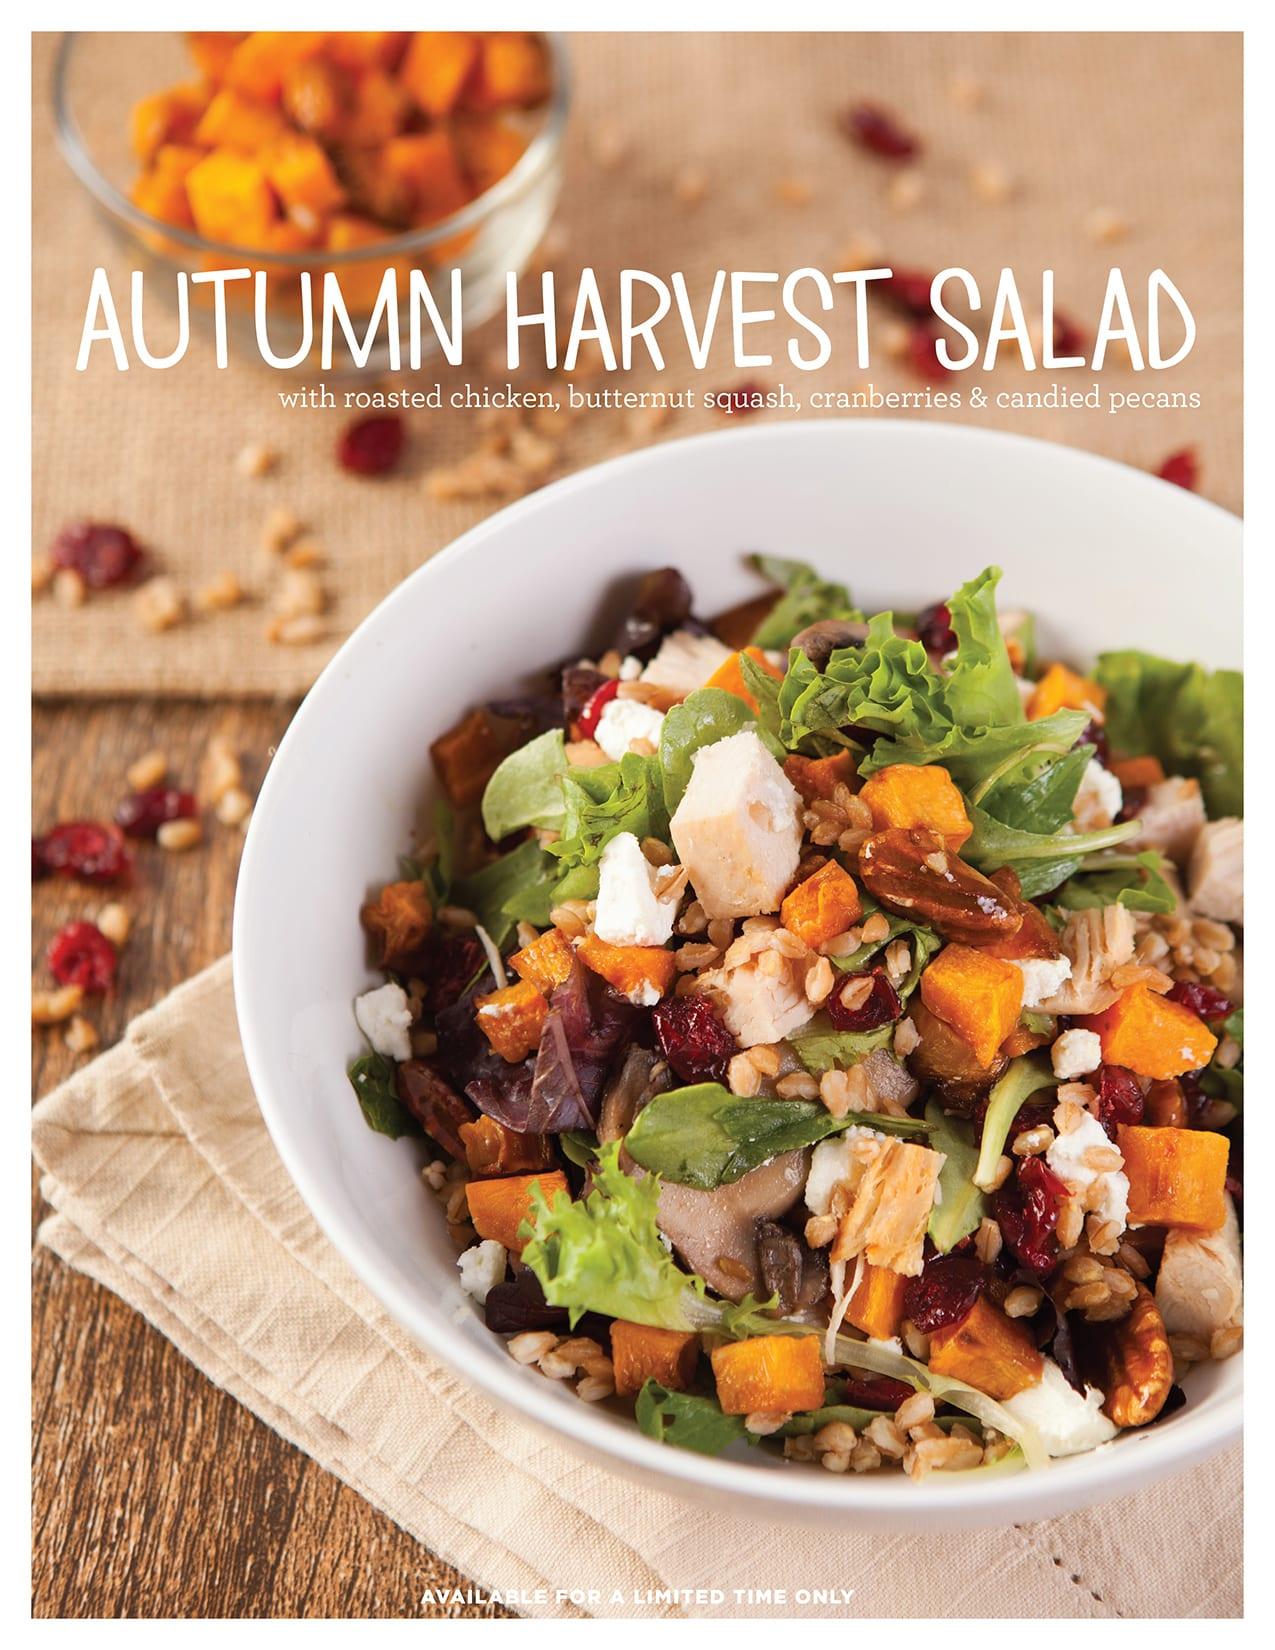 1511_november-LTOs_autumn-harvest-salad_8.5x11_static